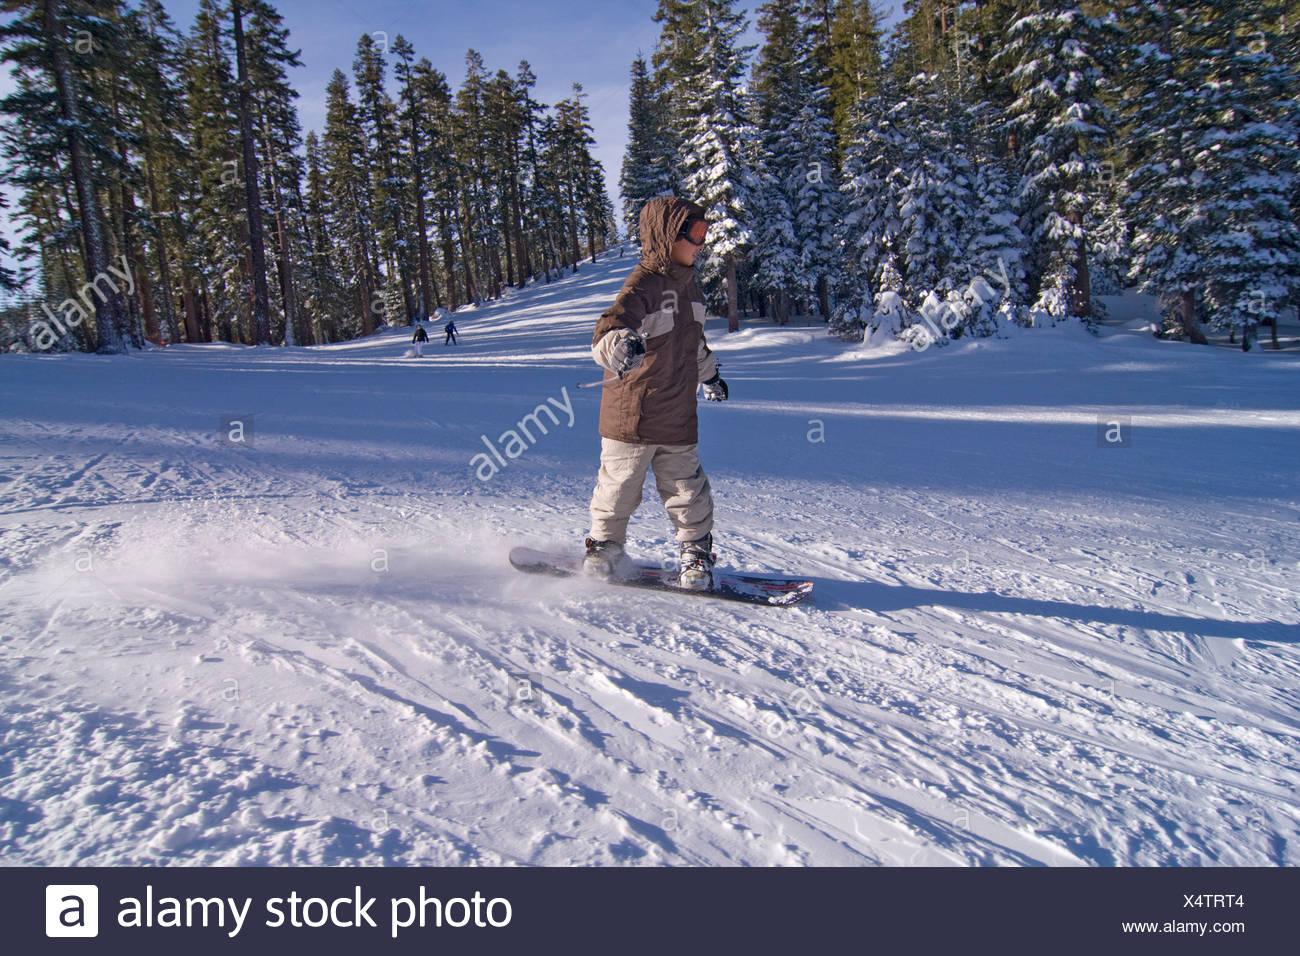 A boy snowboarding at Sierra at Tahoe ski resort near Lake Tahoe in California Stock Photo